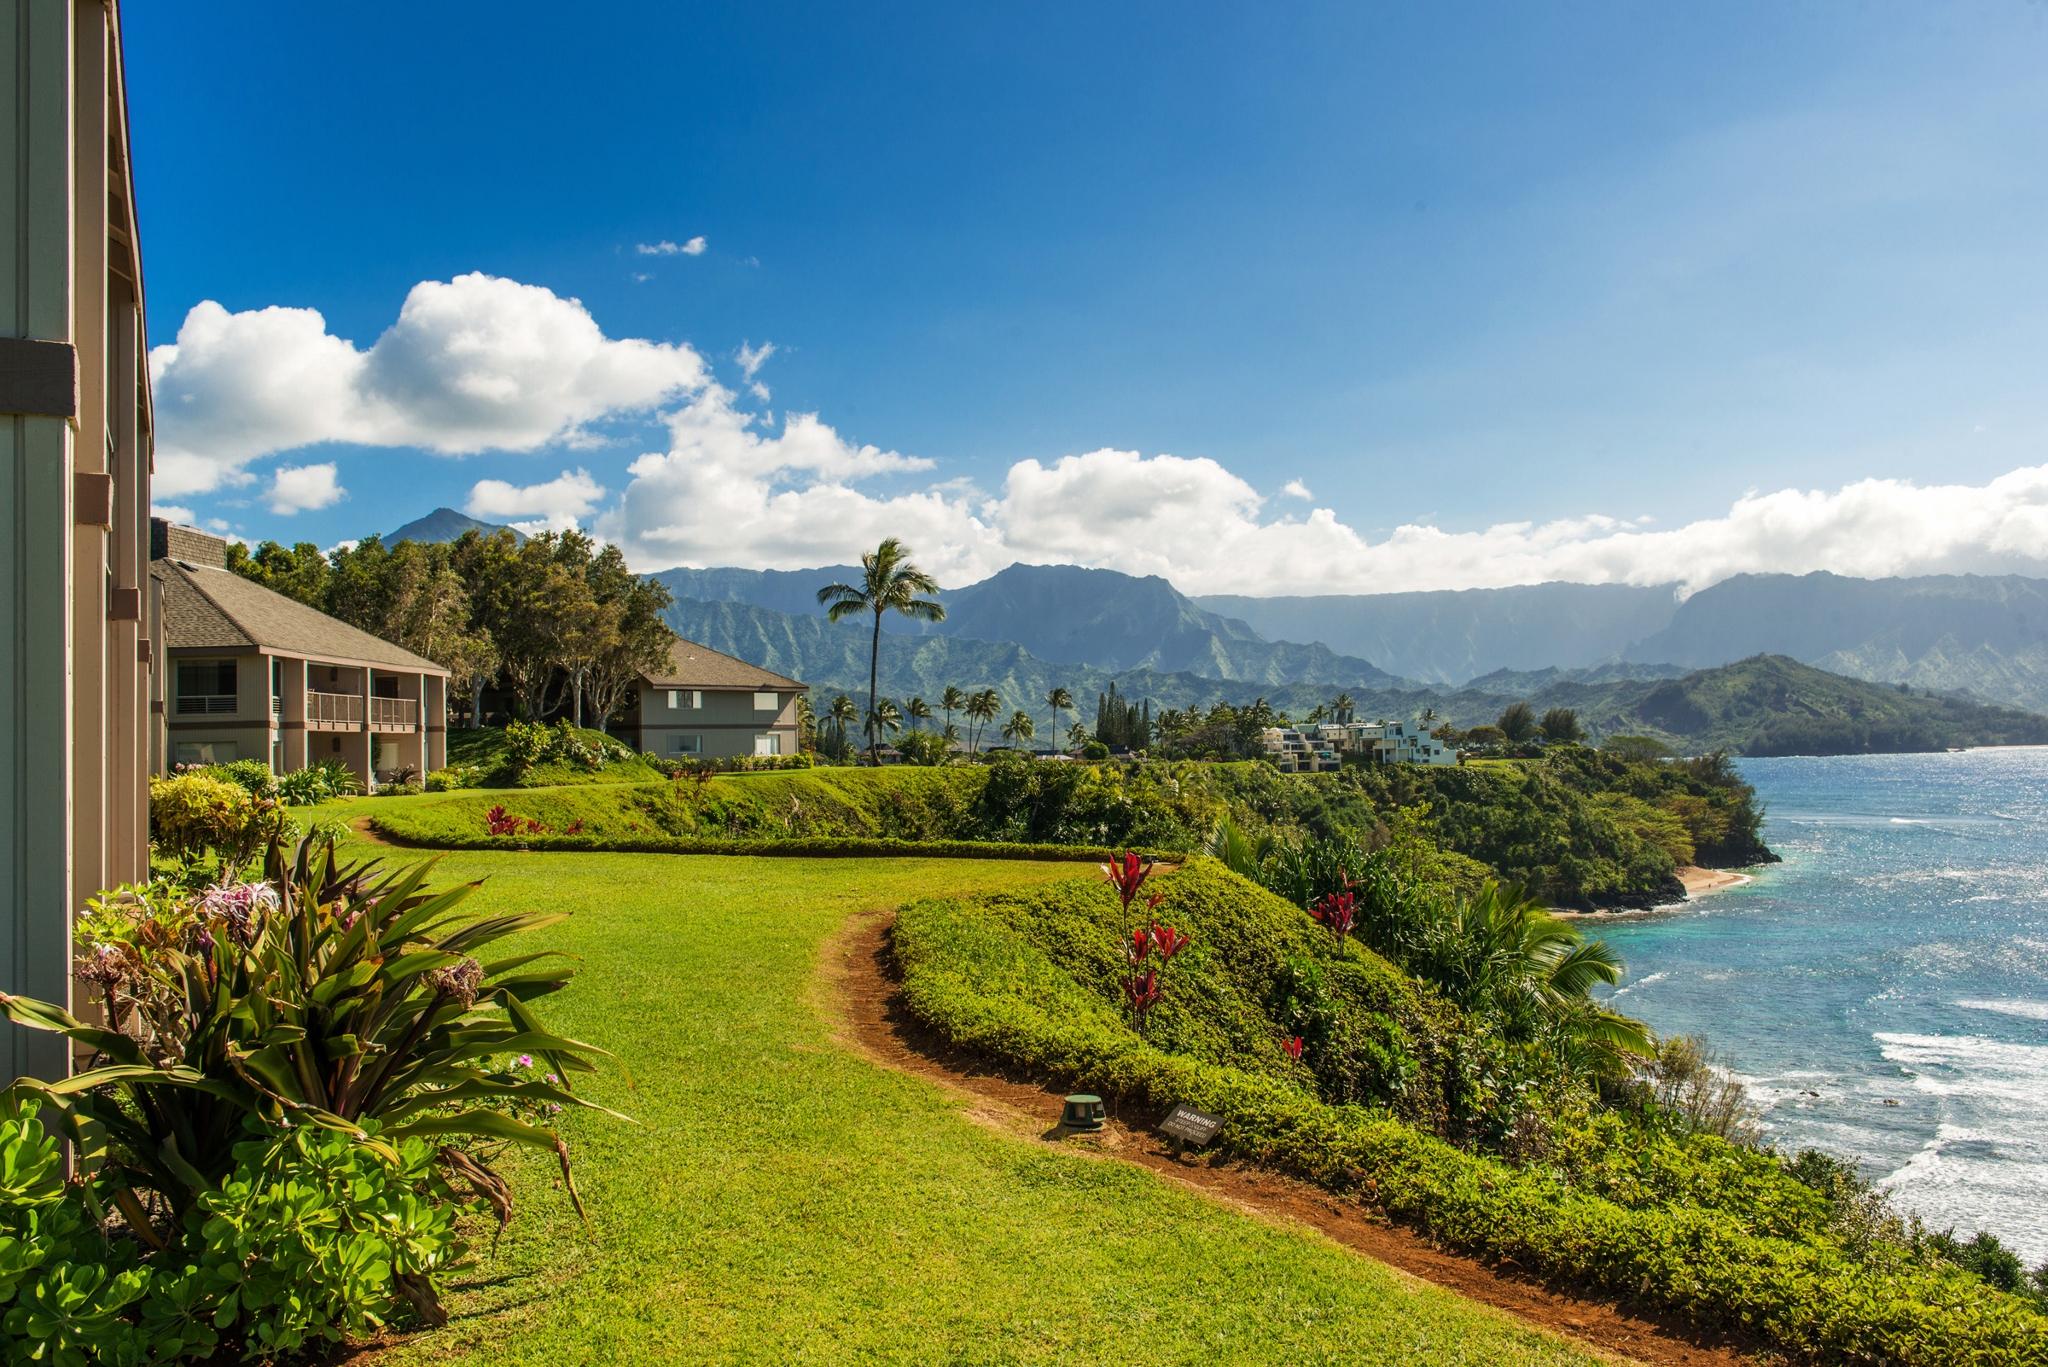 Property Of Pali Ke Kua 225